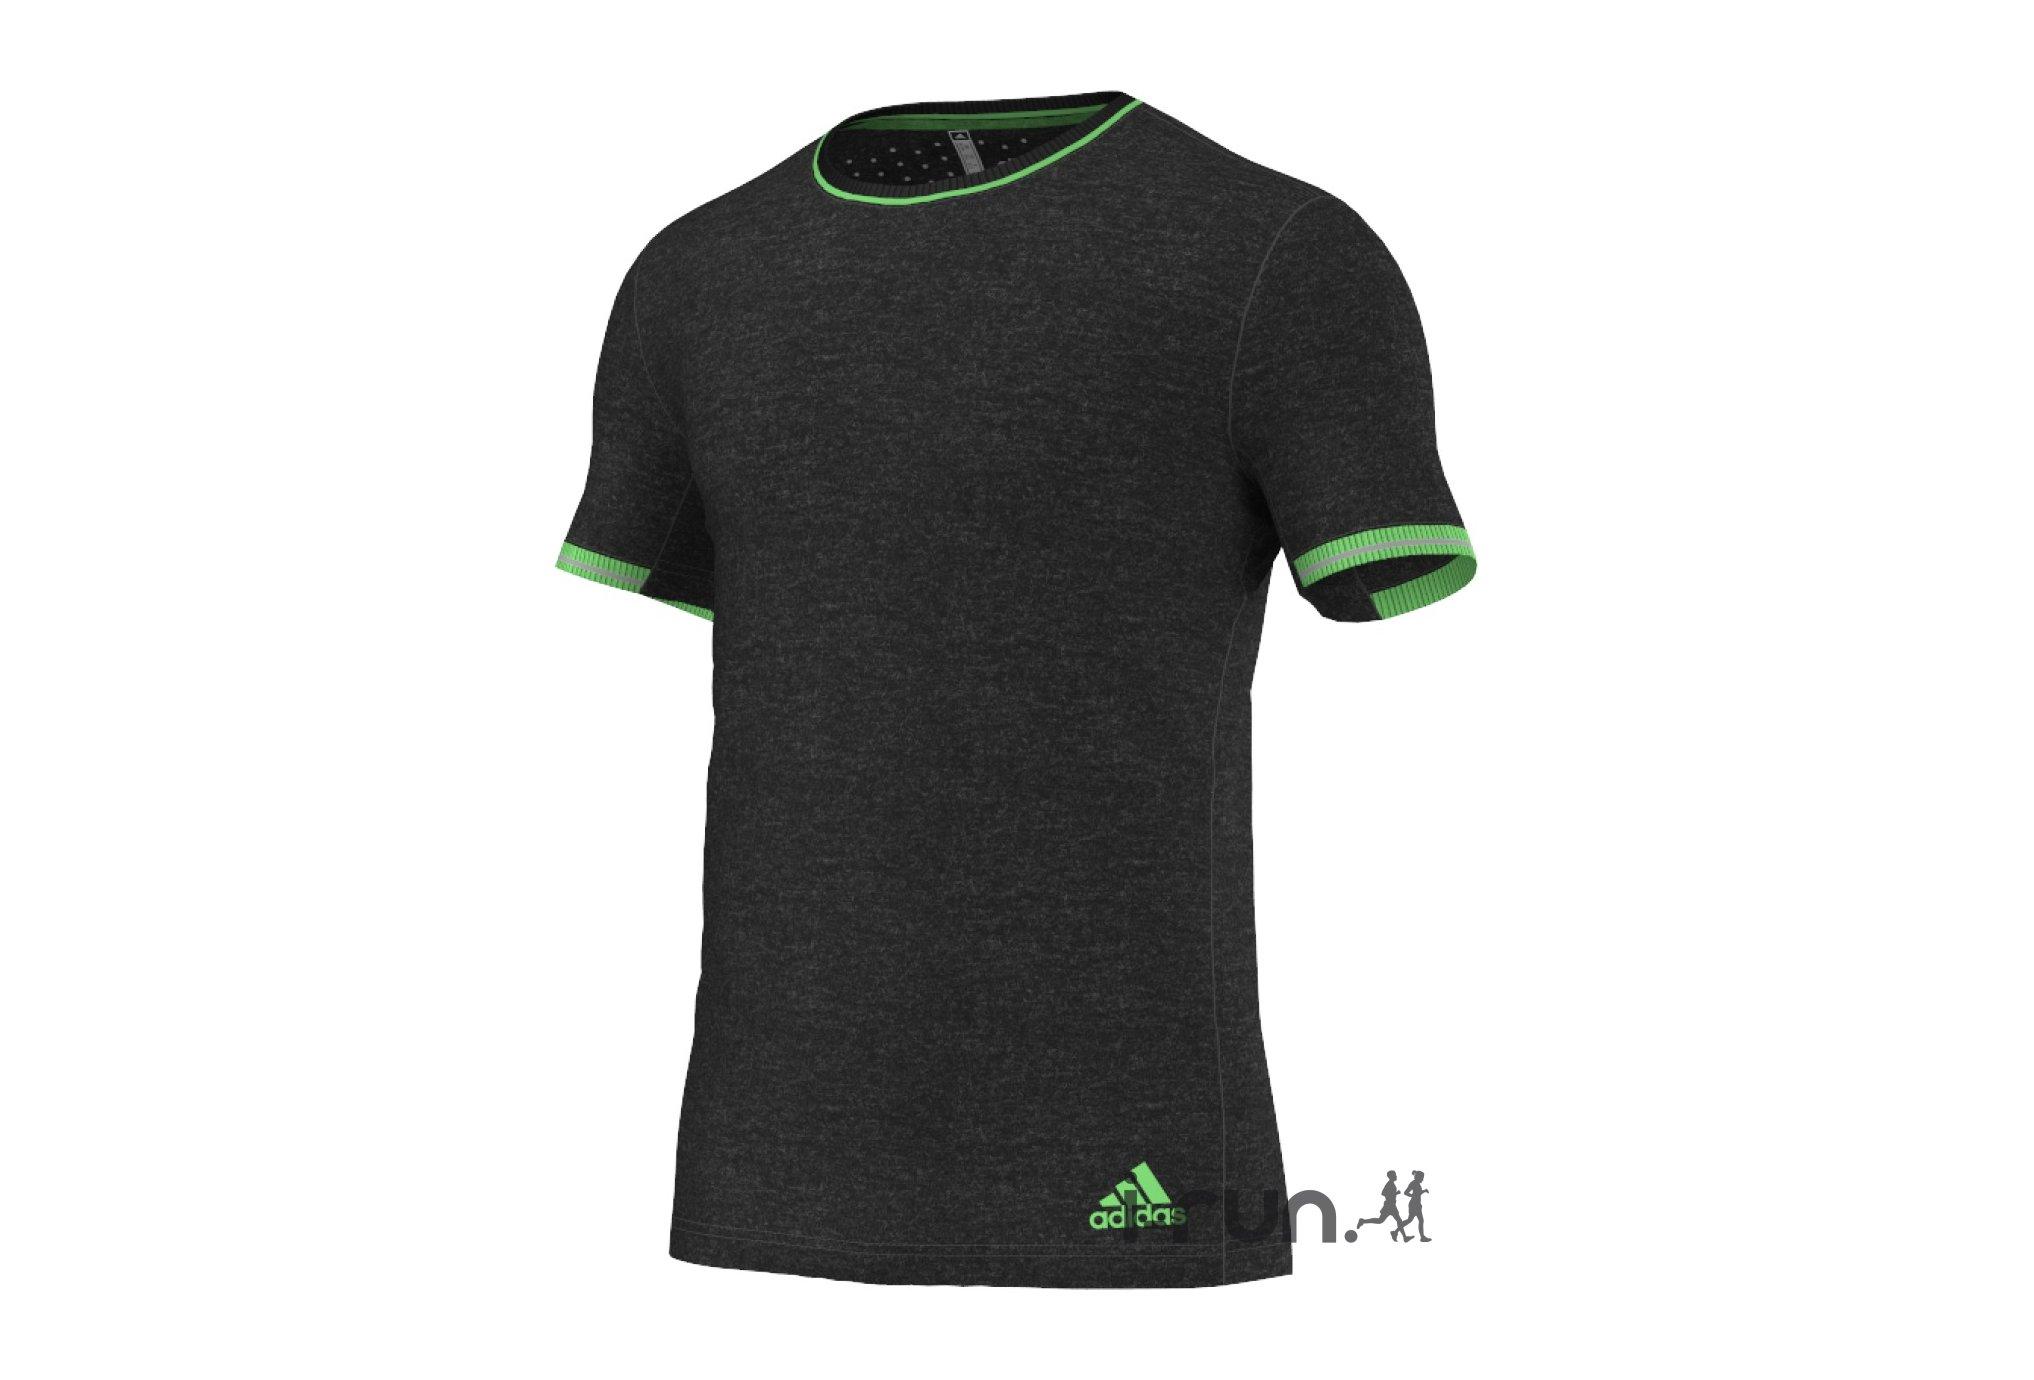 adidas Tee-shirt Supernova ClimaChill M v�tement running homme